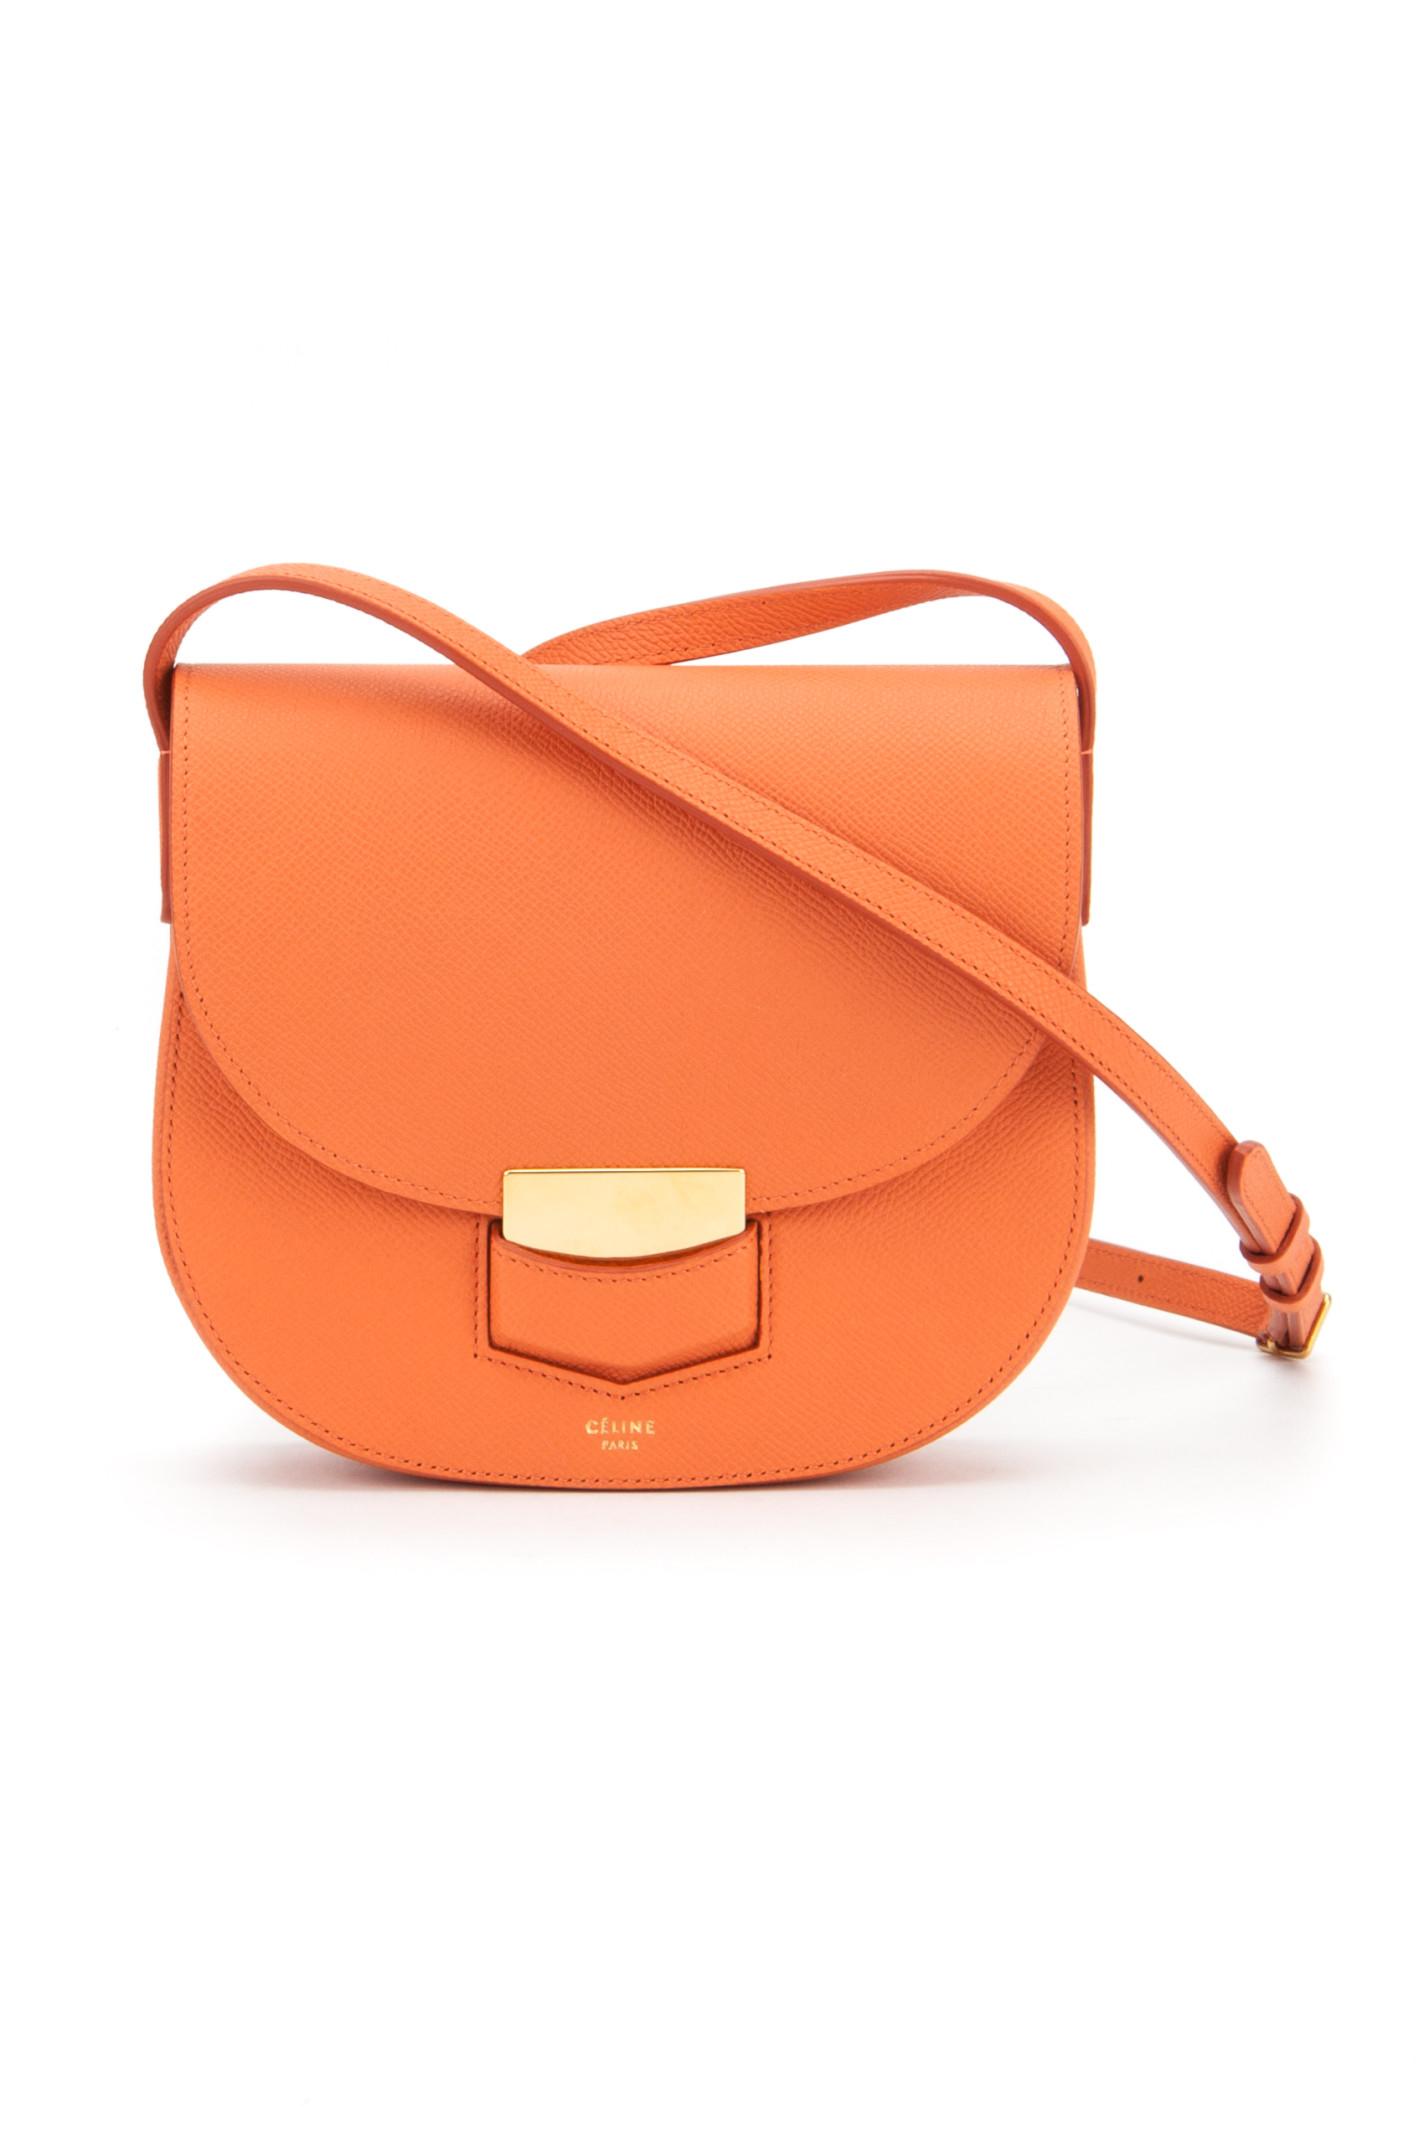 celine nano bag for sale - celine orange clutch bag